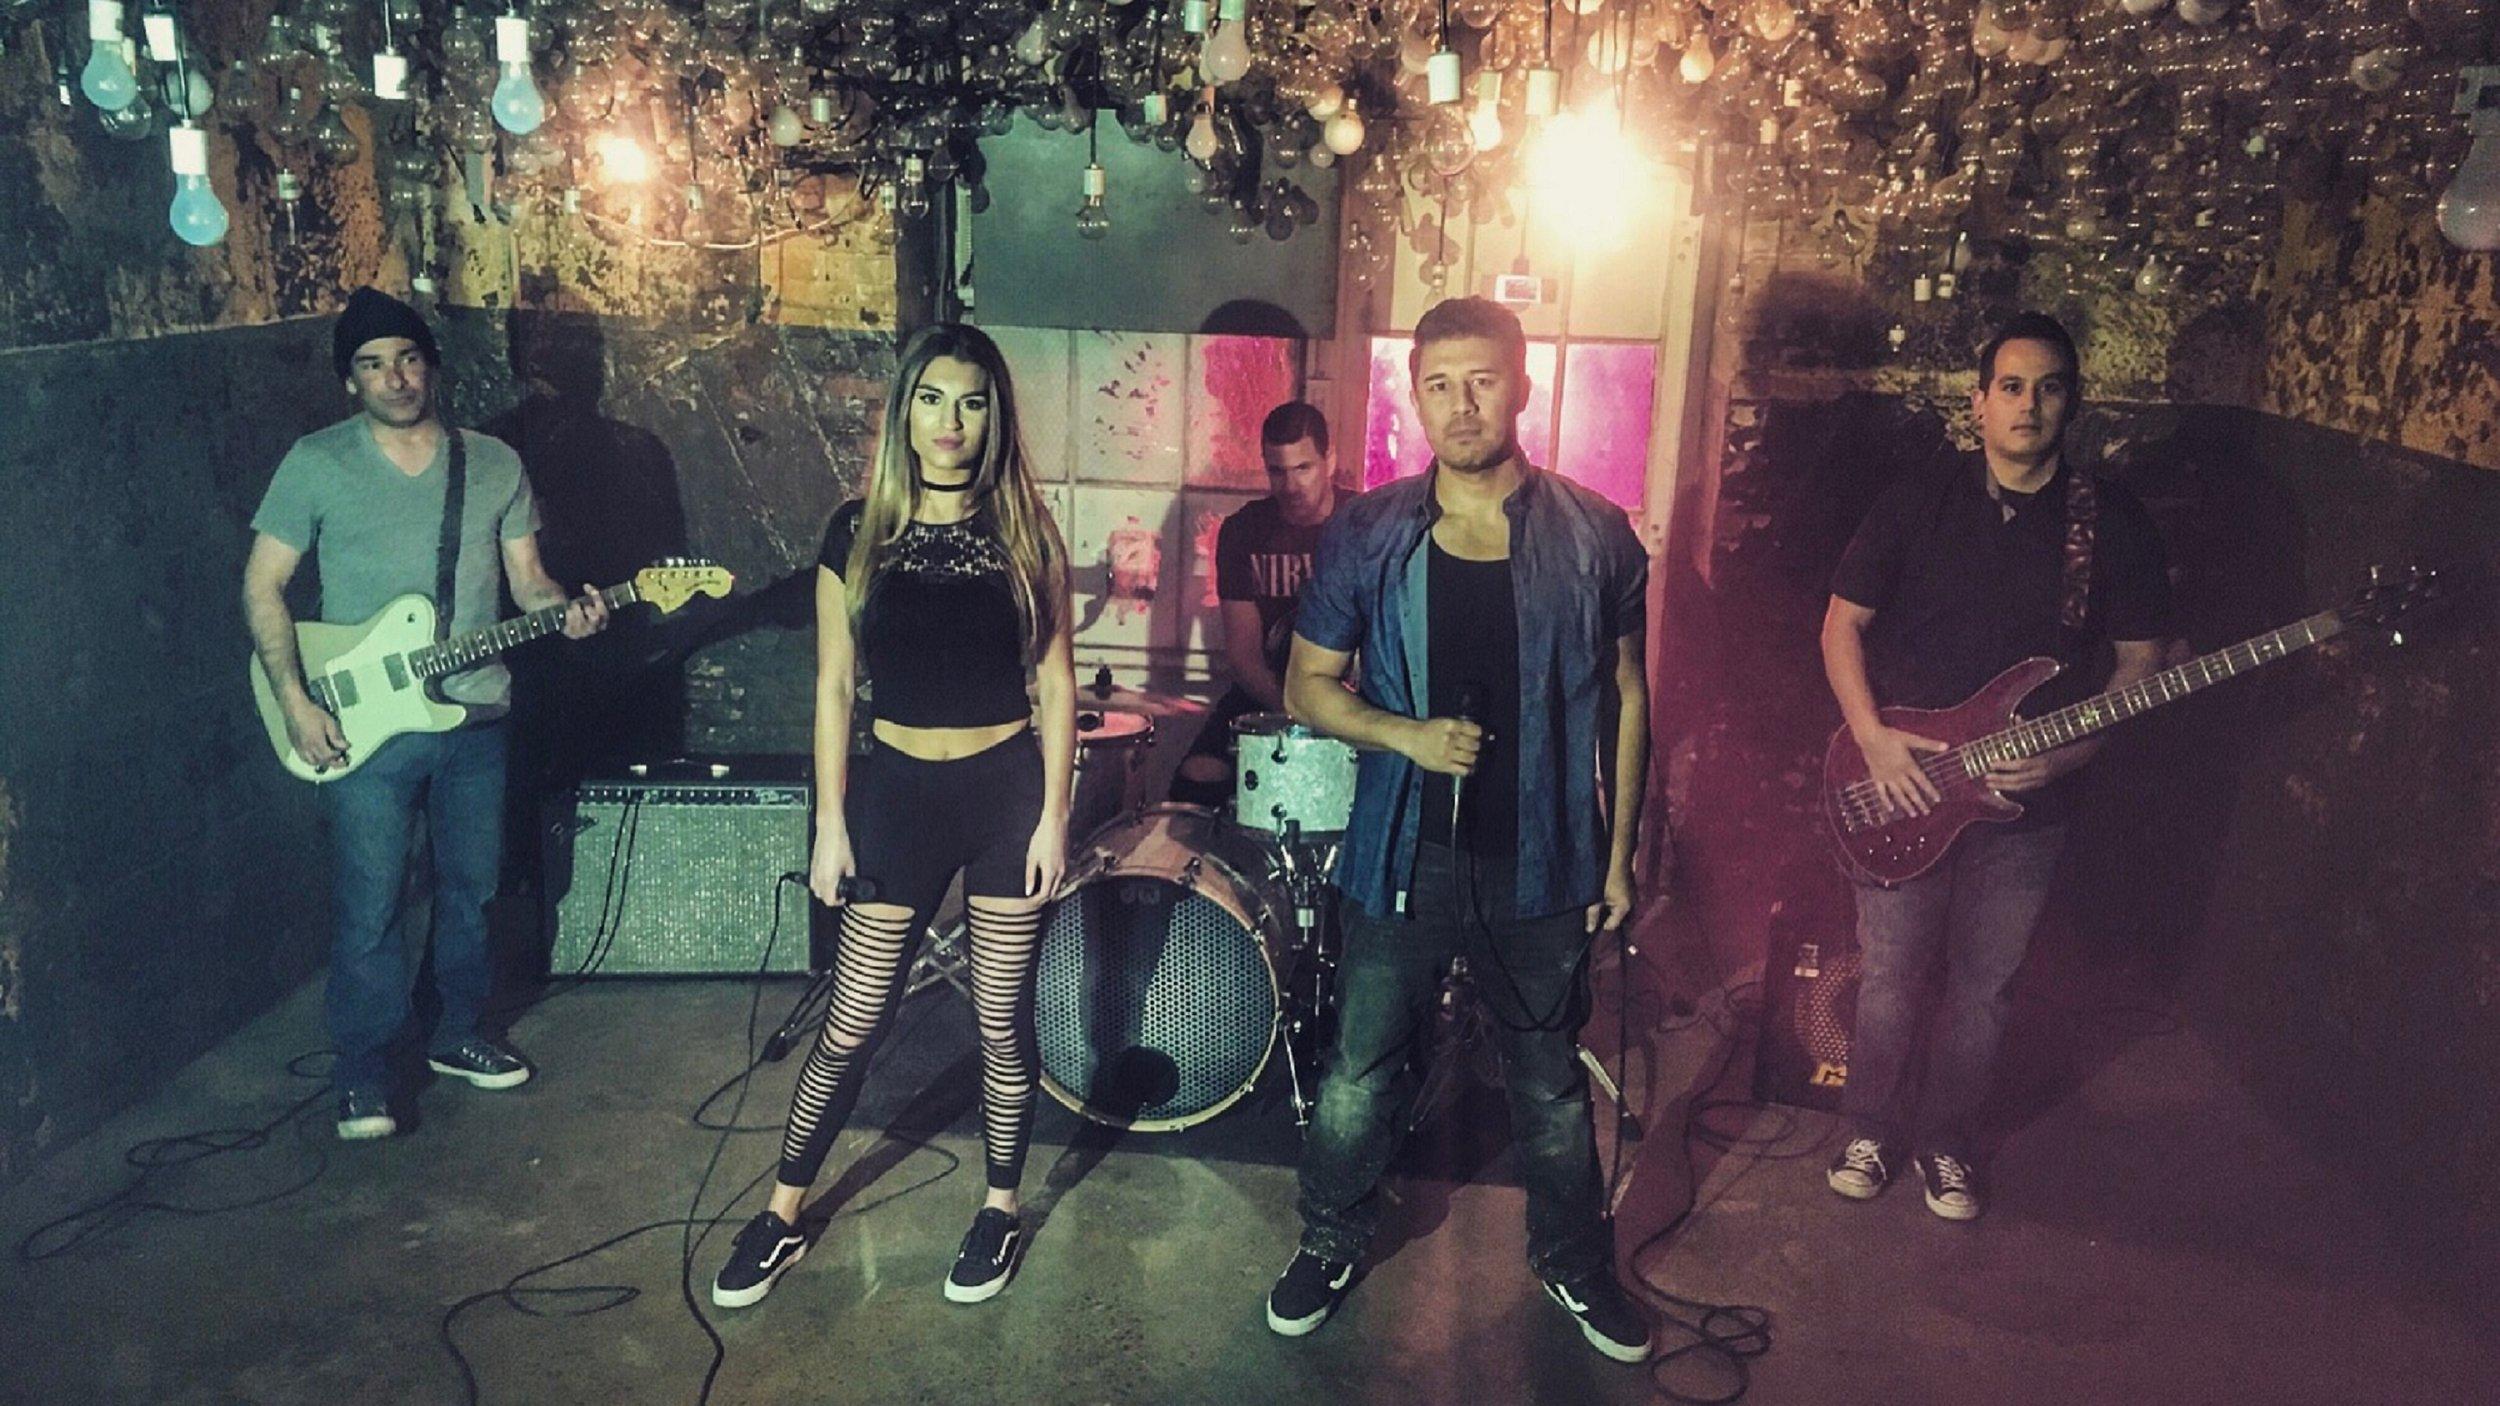 Members: Bryan Zamzam - Male vocals; Chelsea Rose - Female vocals; Andrew - Guitar; Christian Budiarjo - Bass; Rick - Drums